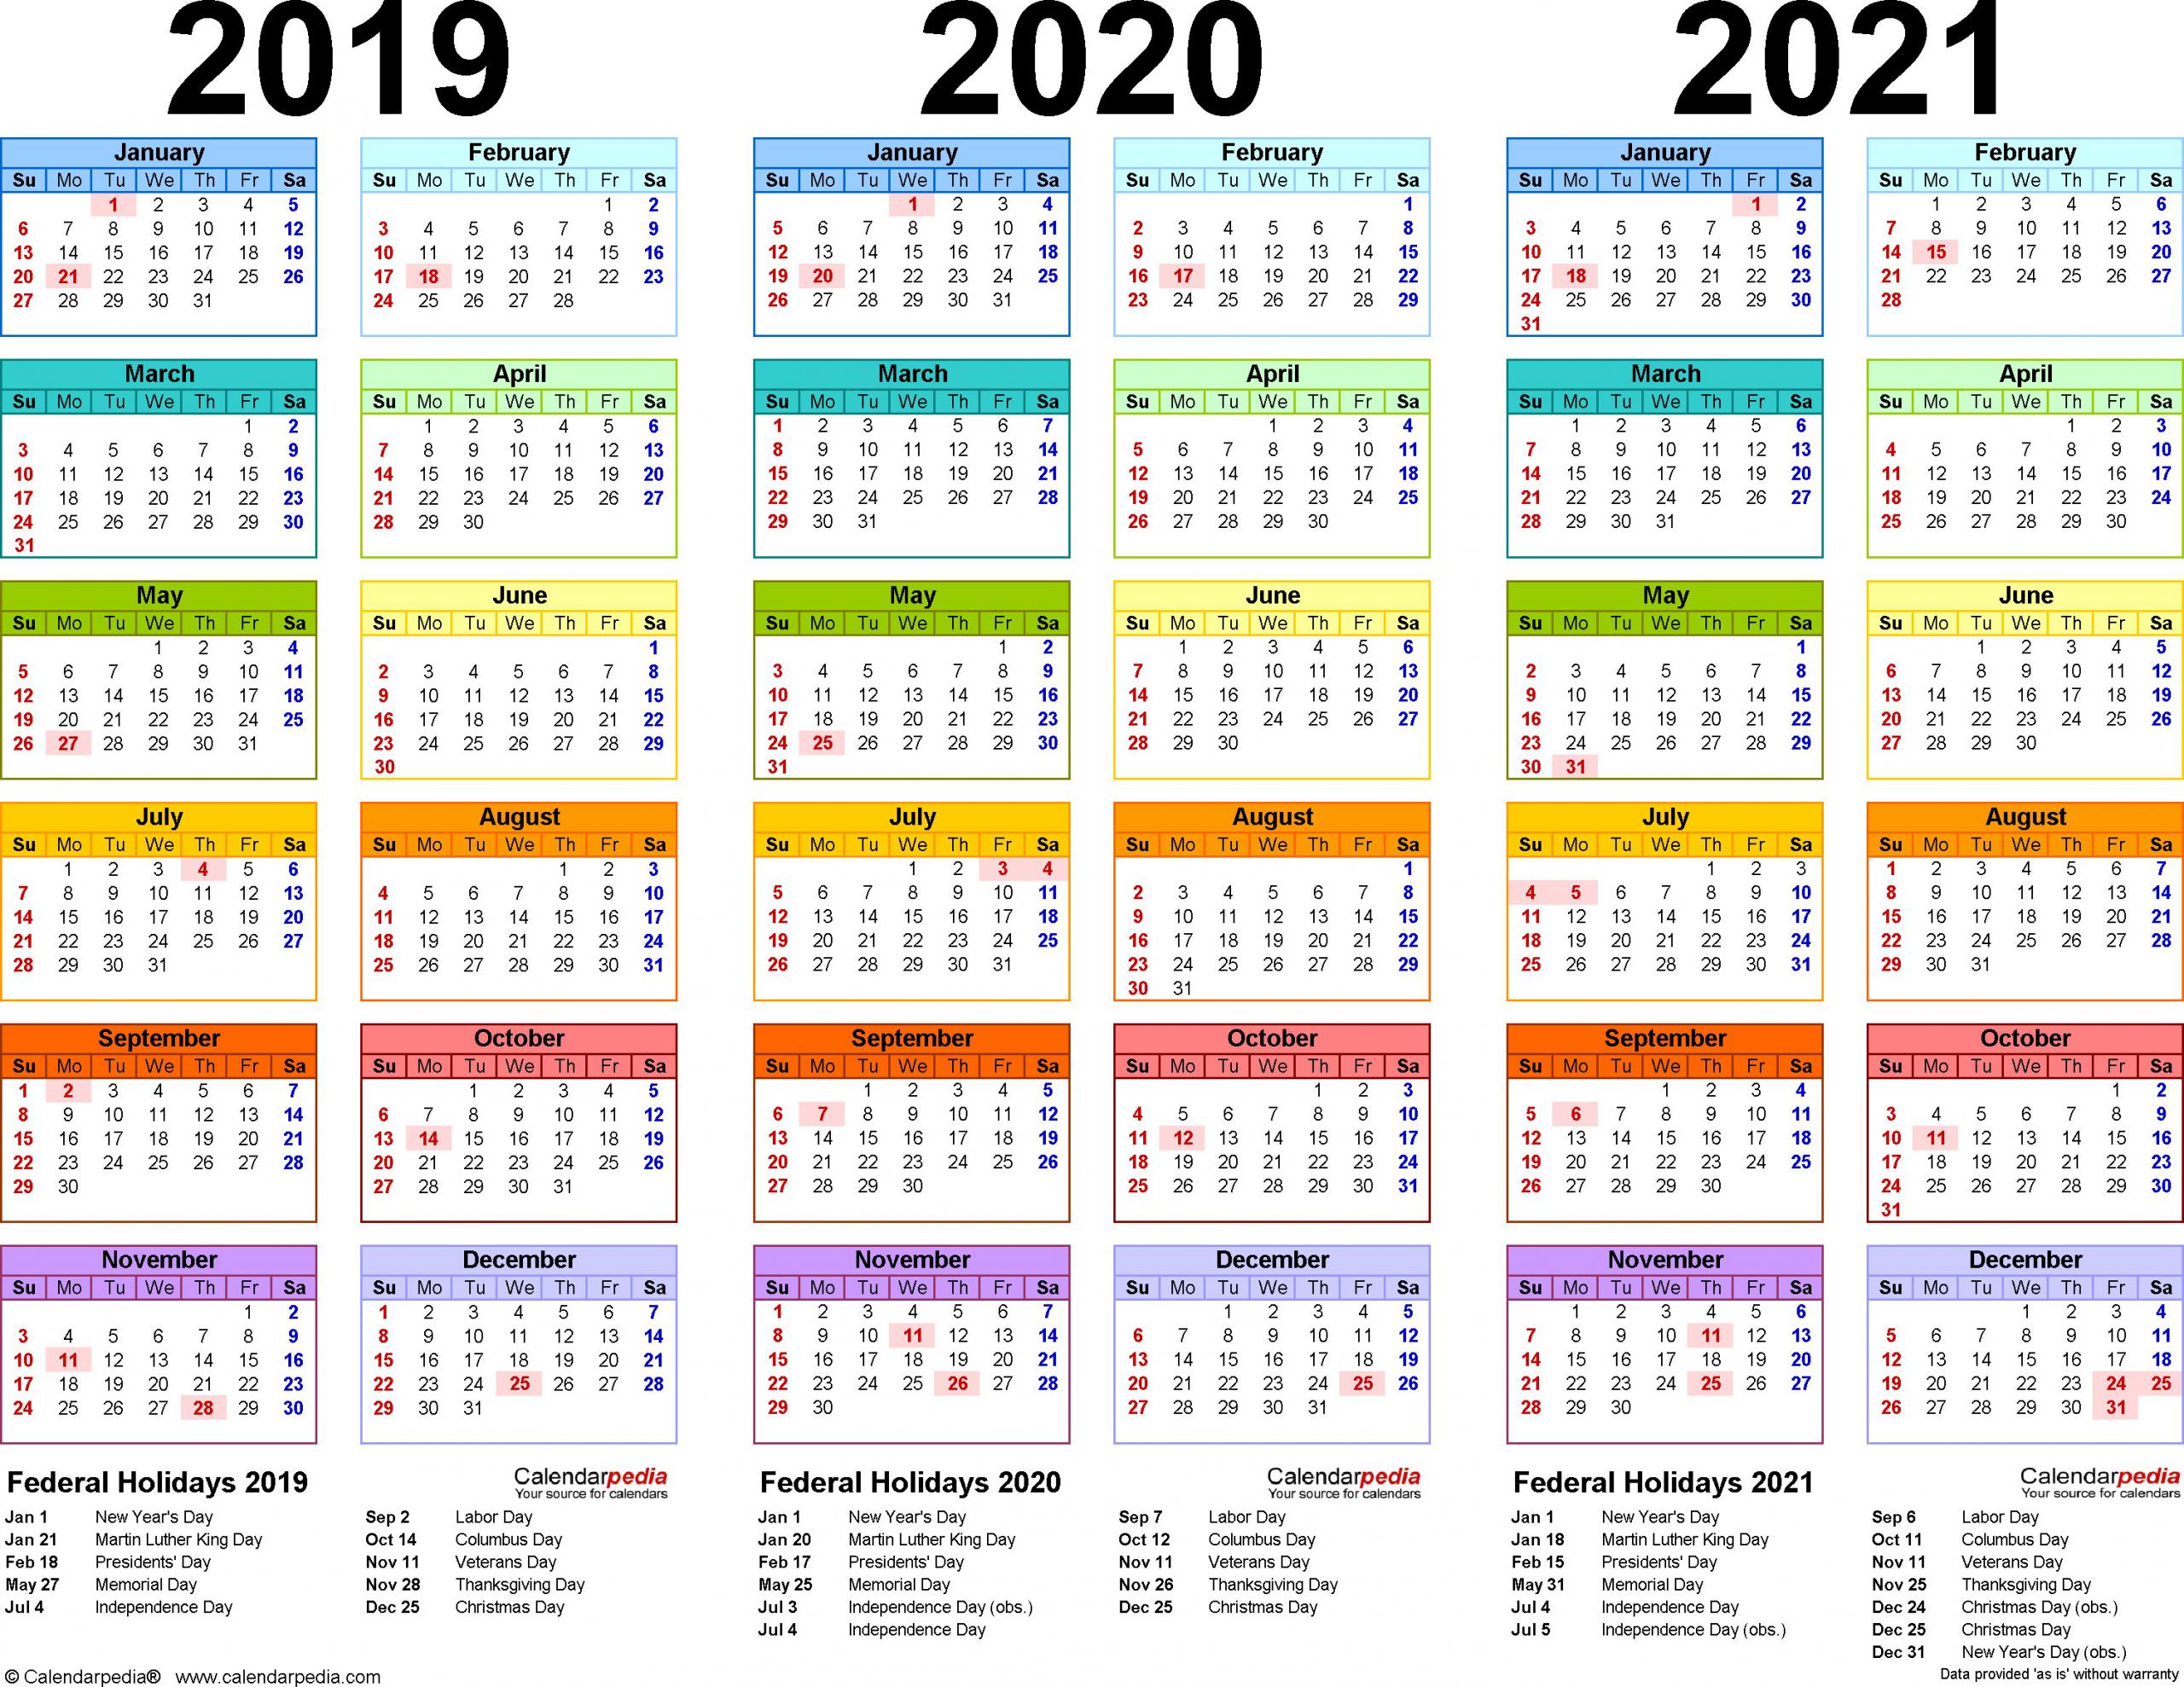 Pin By Minori Ohashi On My Saves In 2020 Calendar 2019 And 2020 Calendar Printables 2021 Calendar